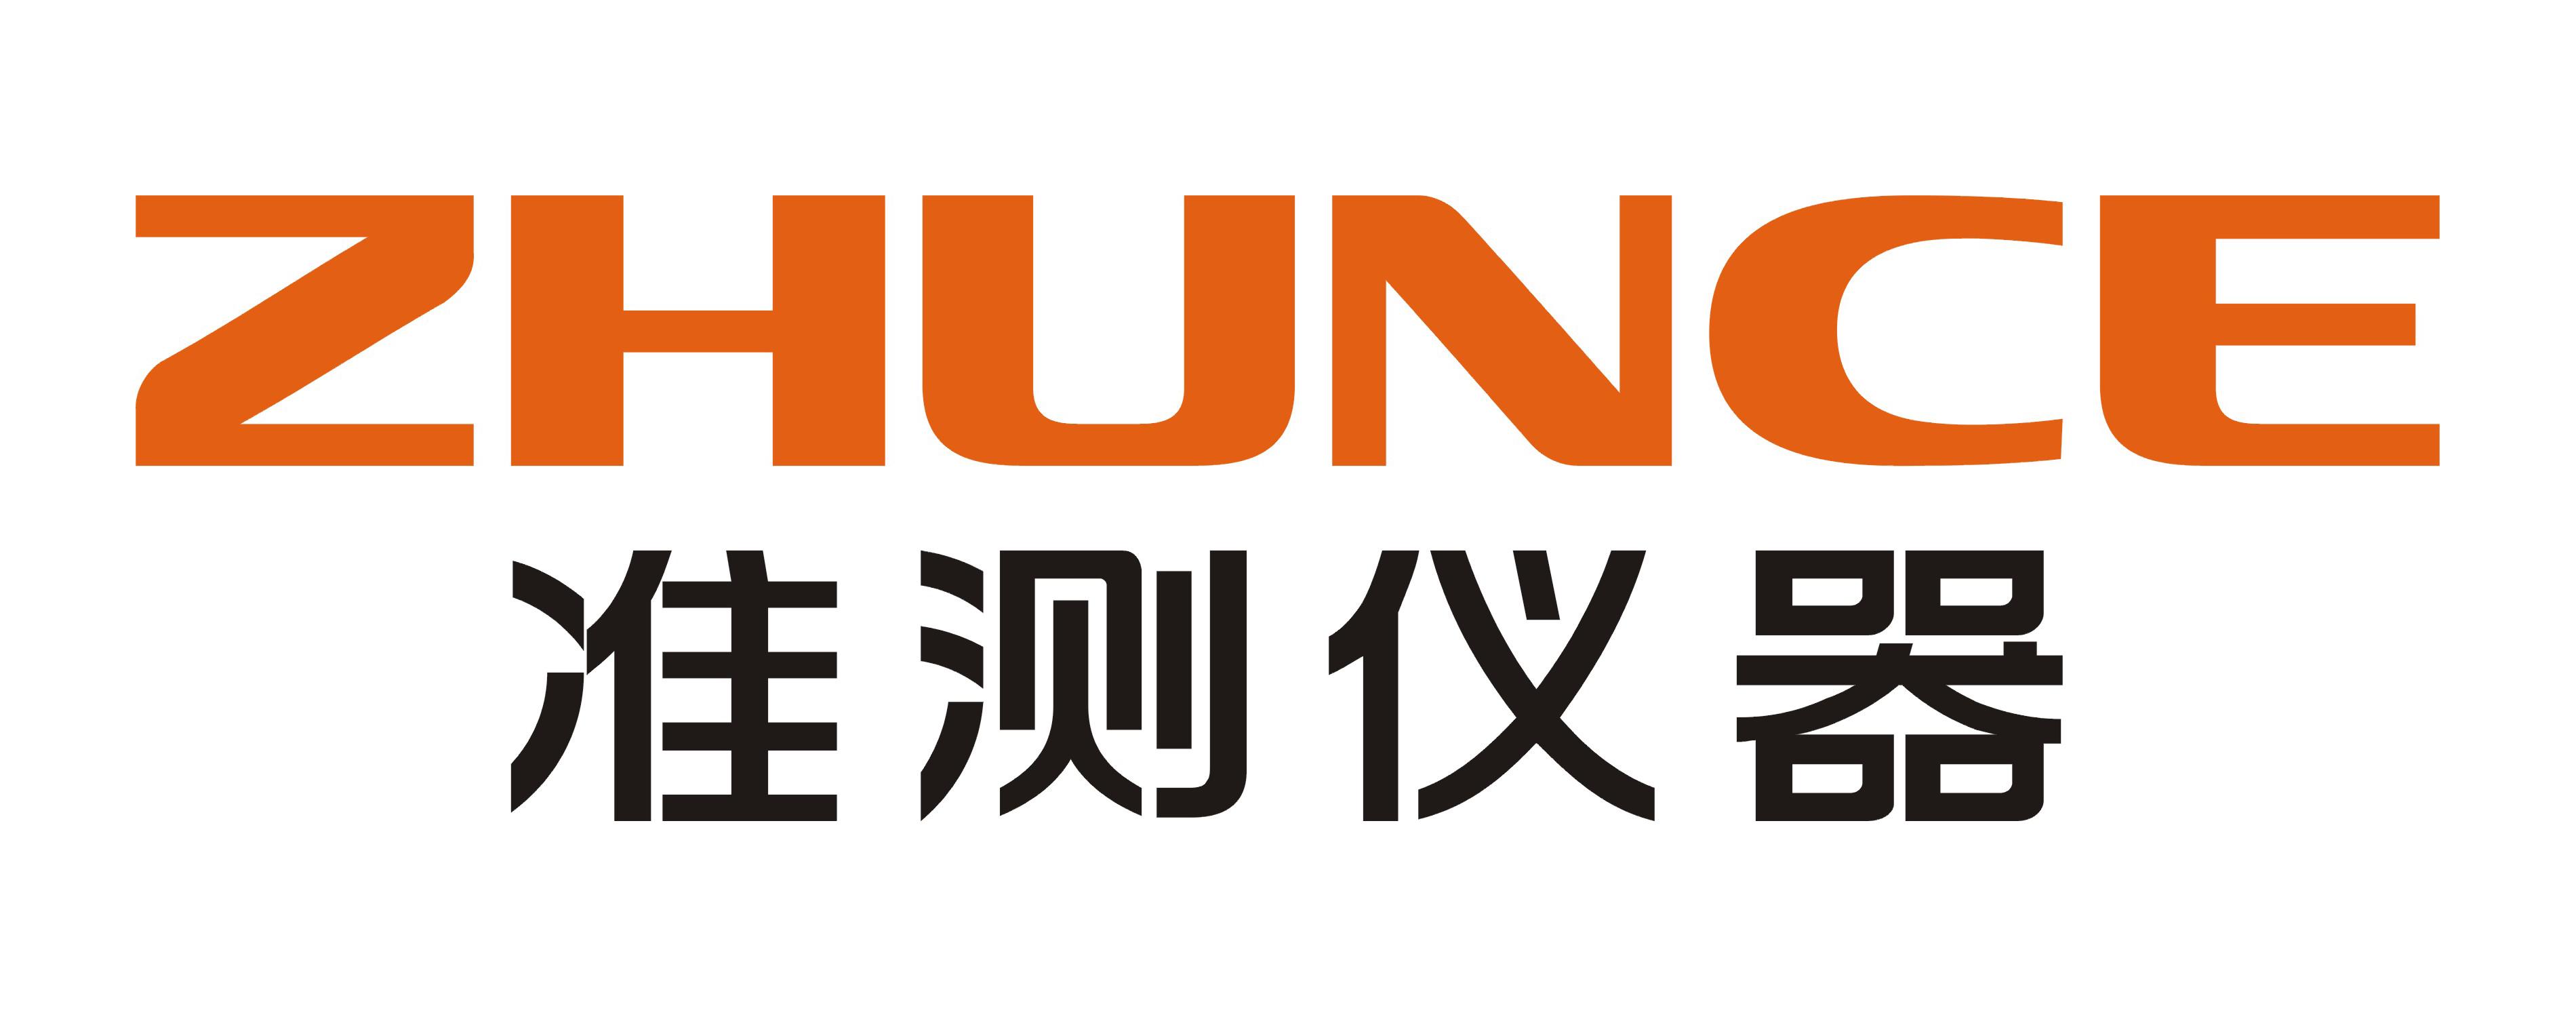 佛山��y�子有限公司logo